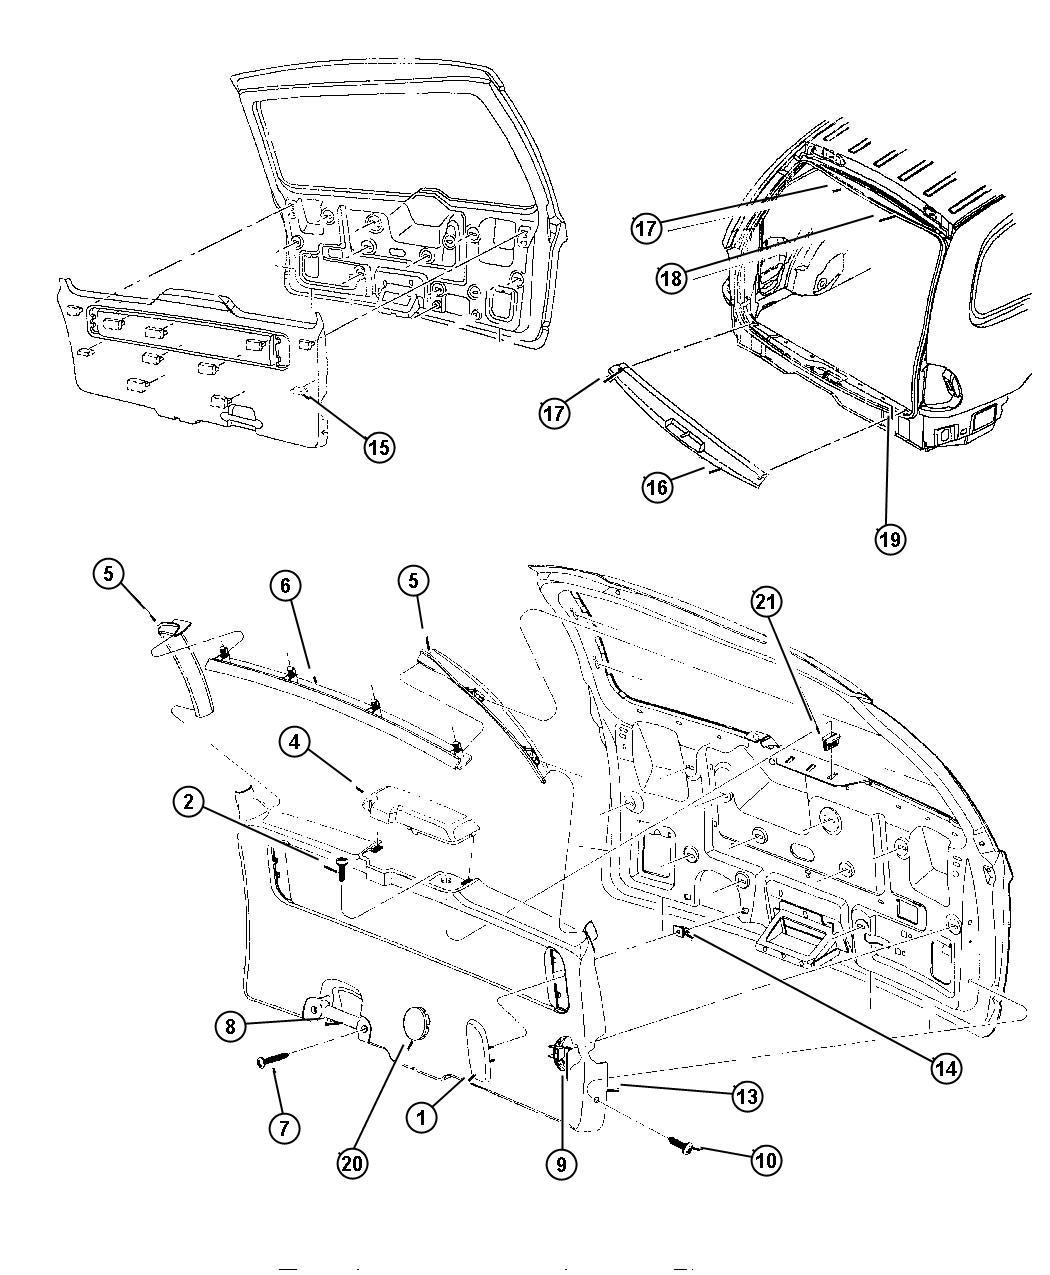 Plymouth Voyager Plug. Sliding door/liftgate. K5, medium